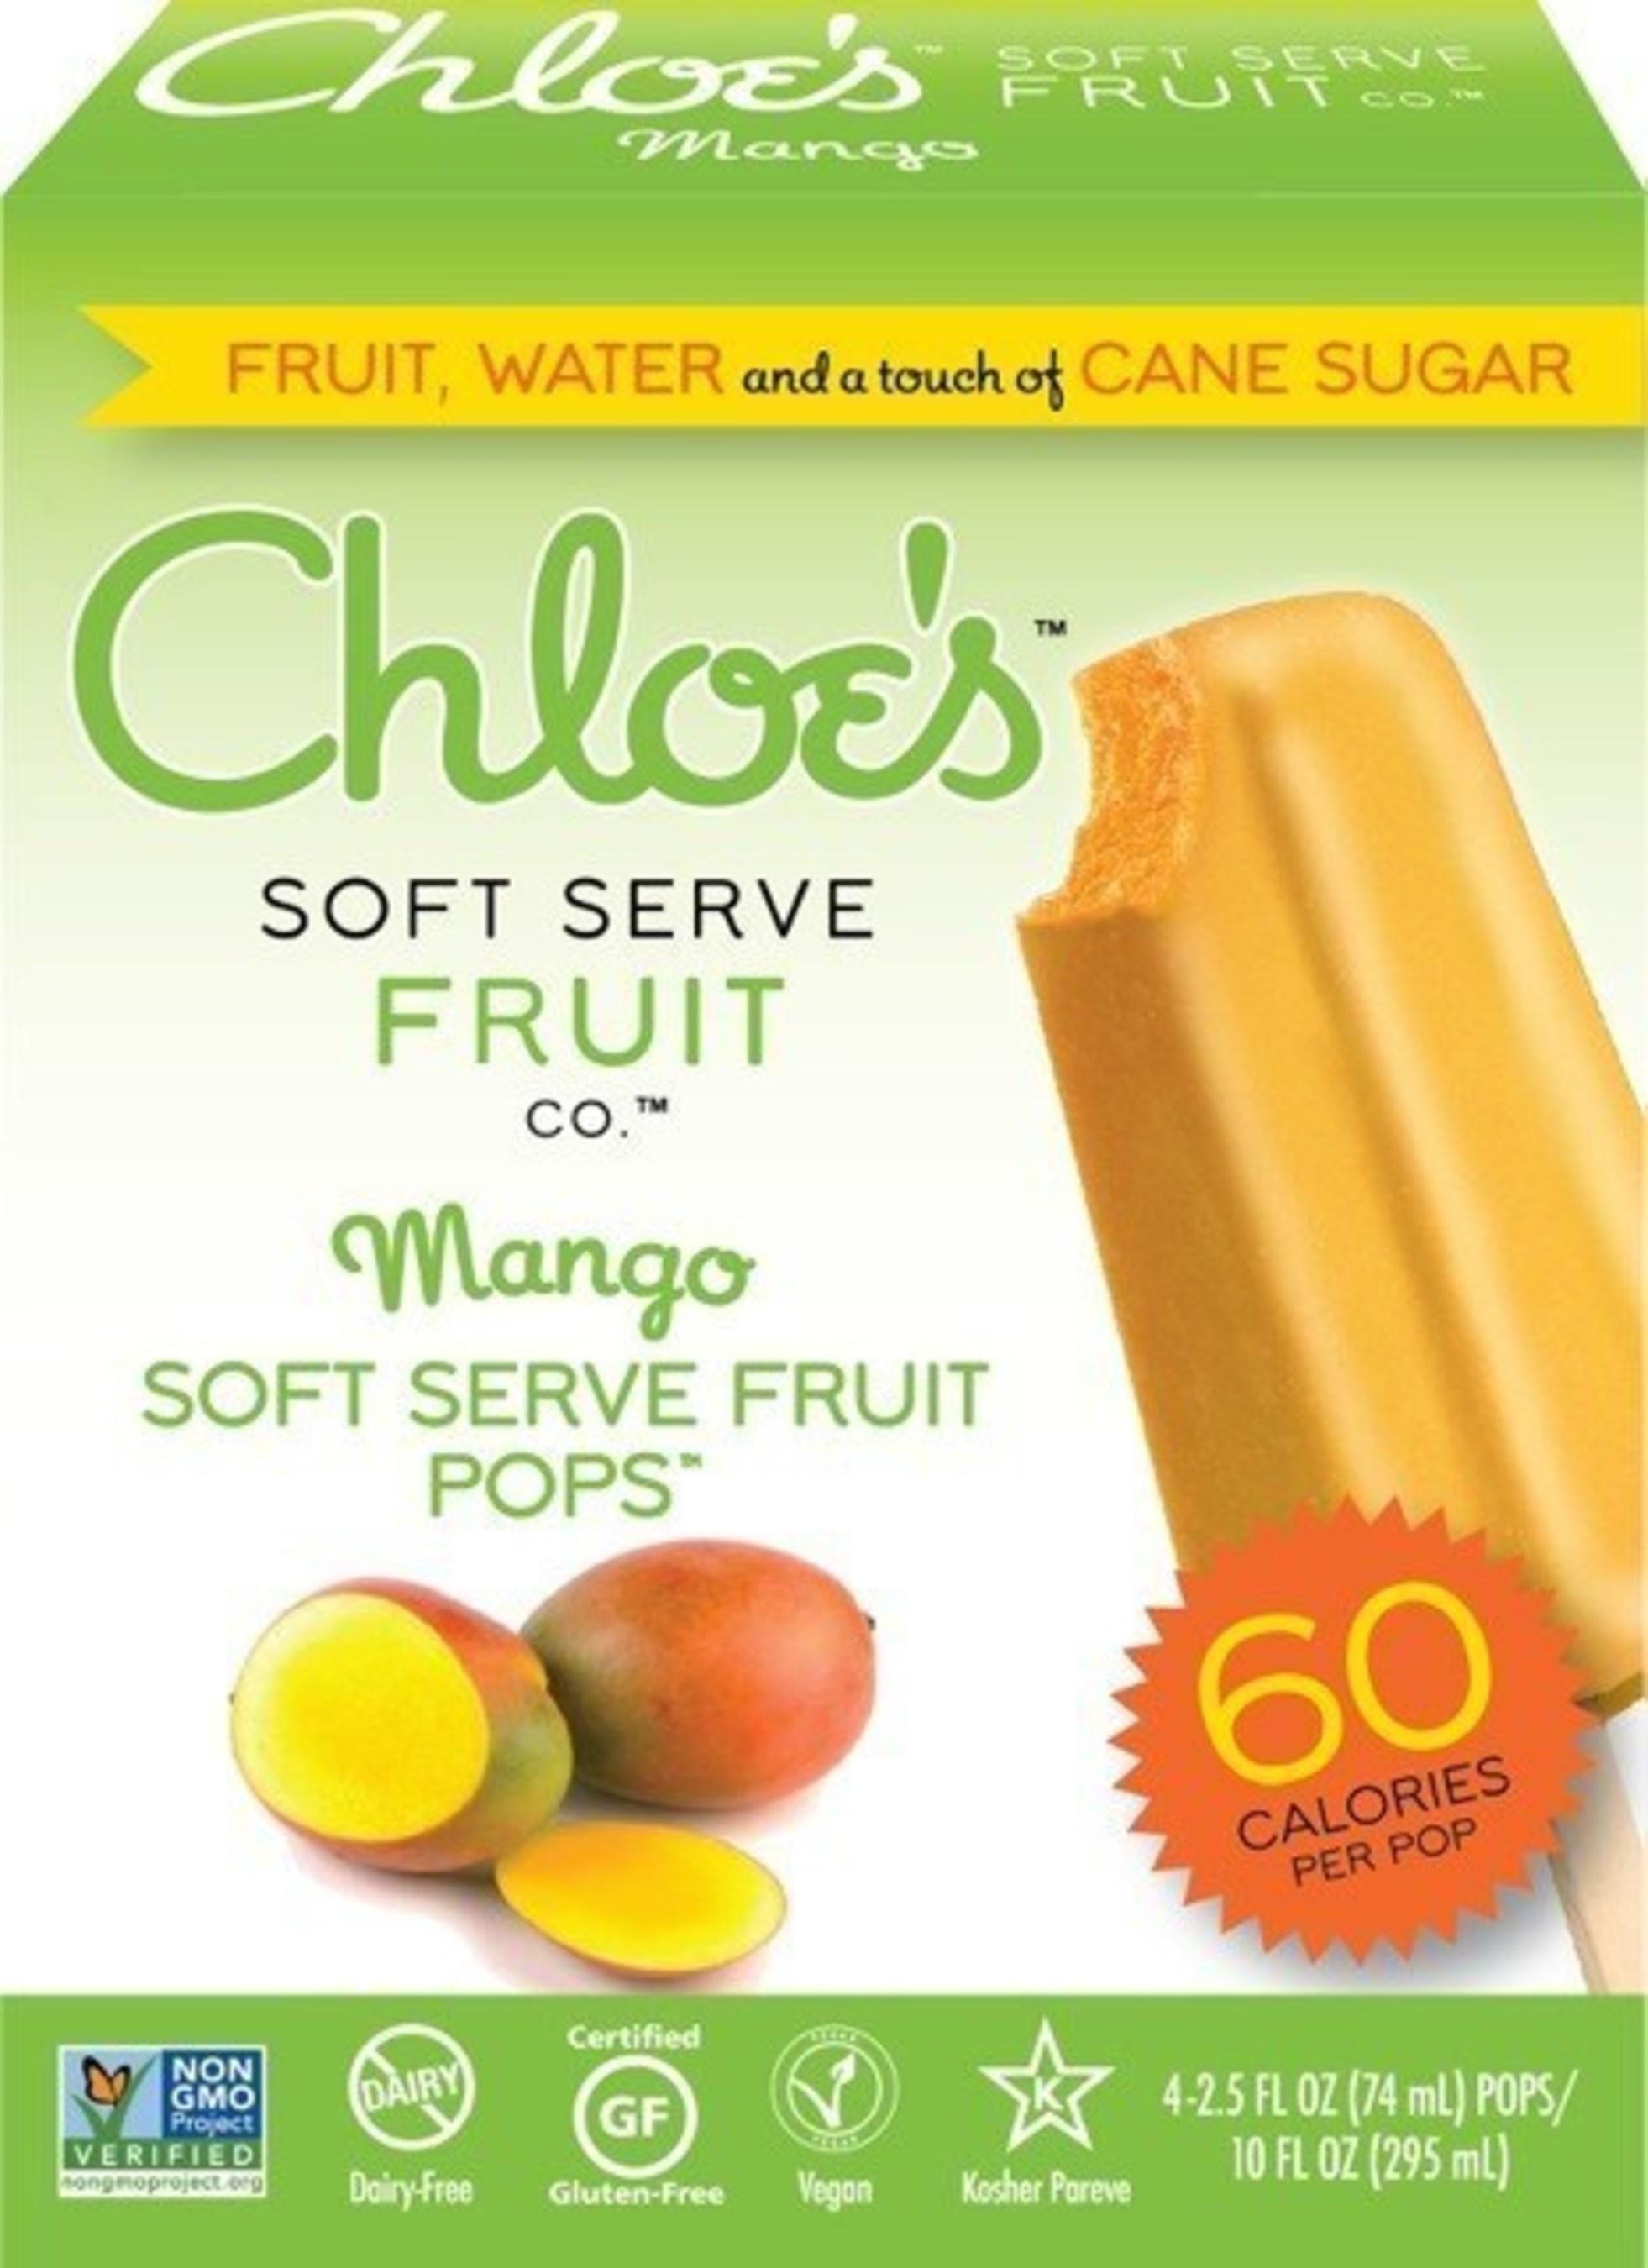 Chloe's Soft Serve Fruit Pops in Mango.